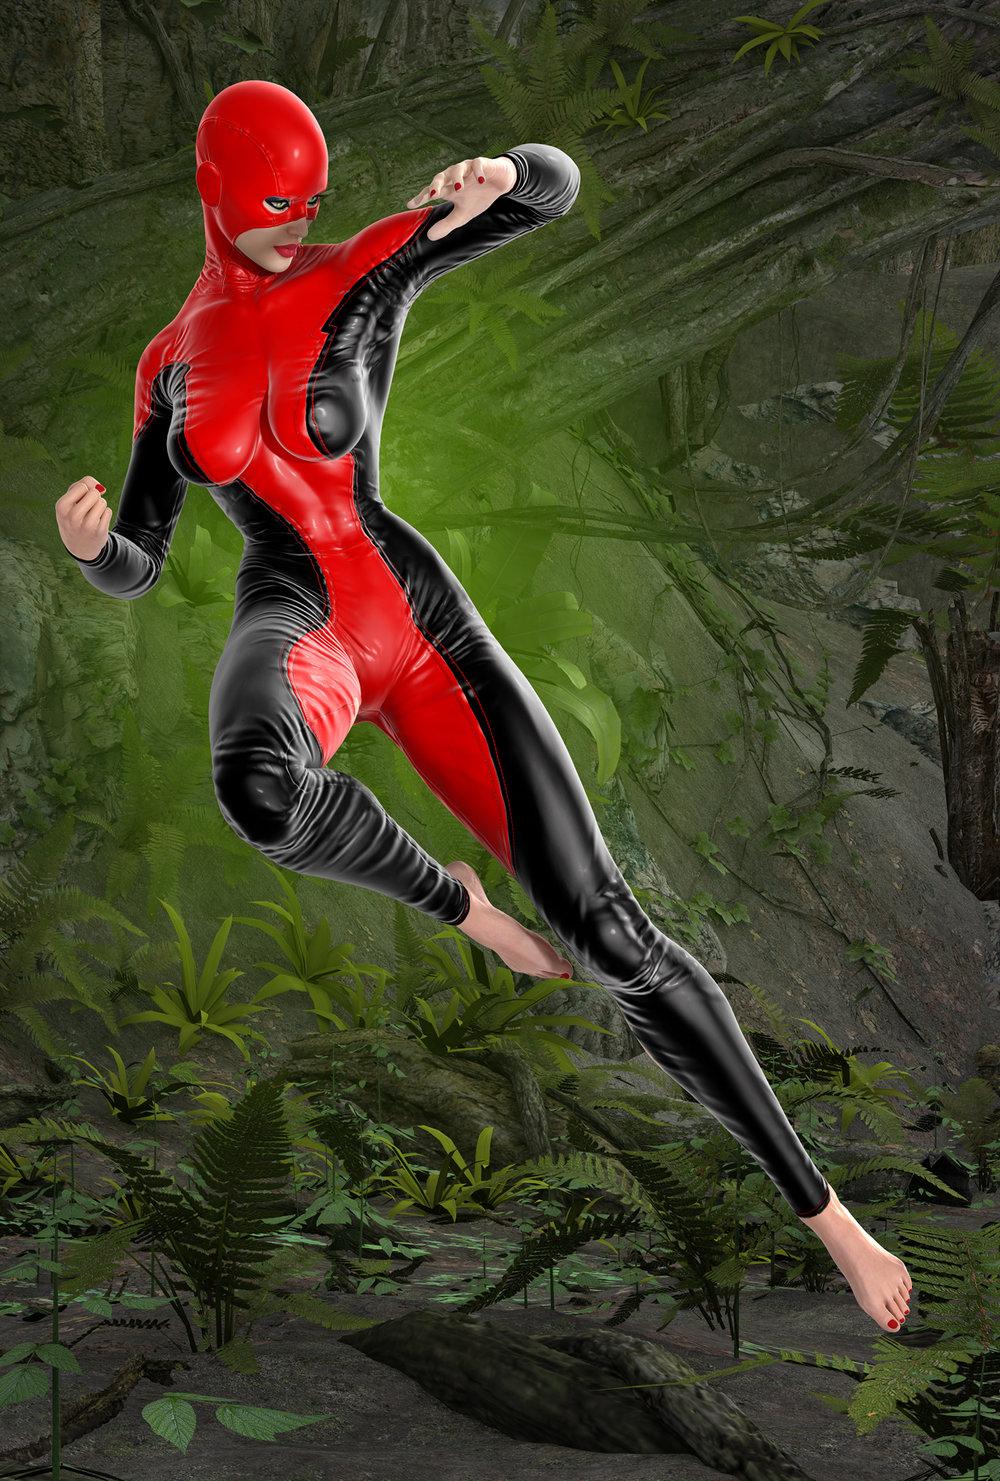 supergirl-54x80.jpg